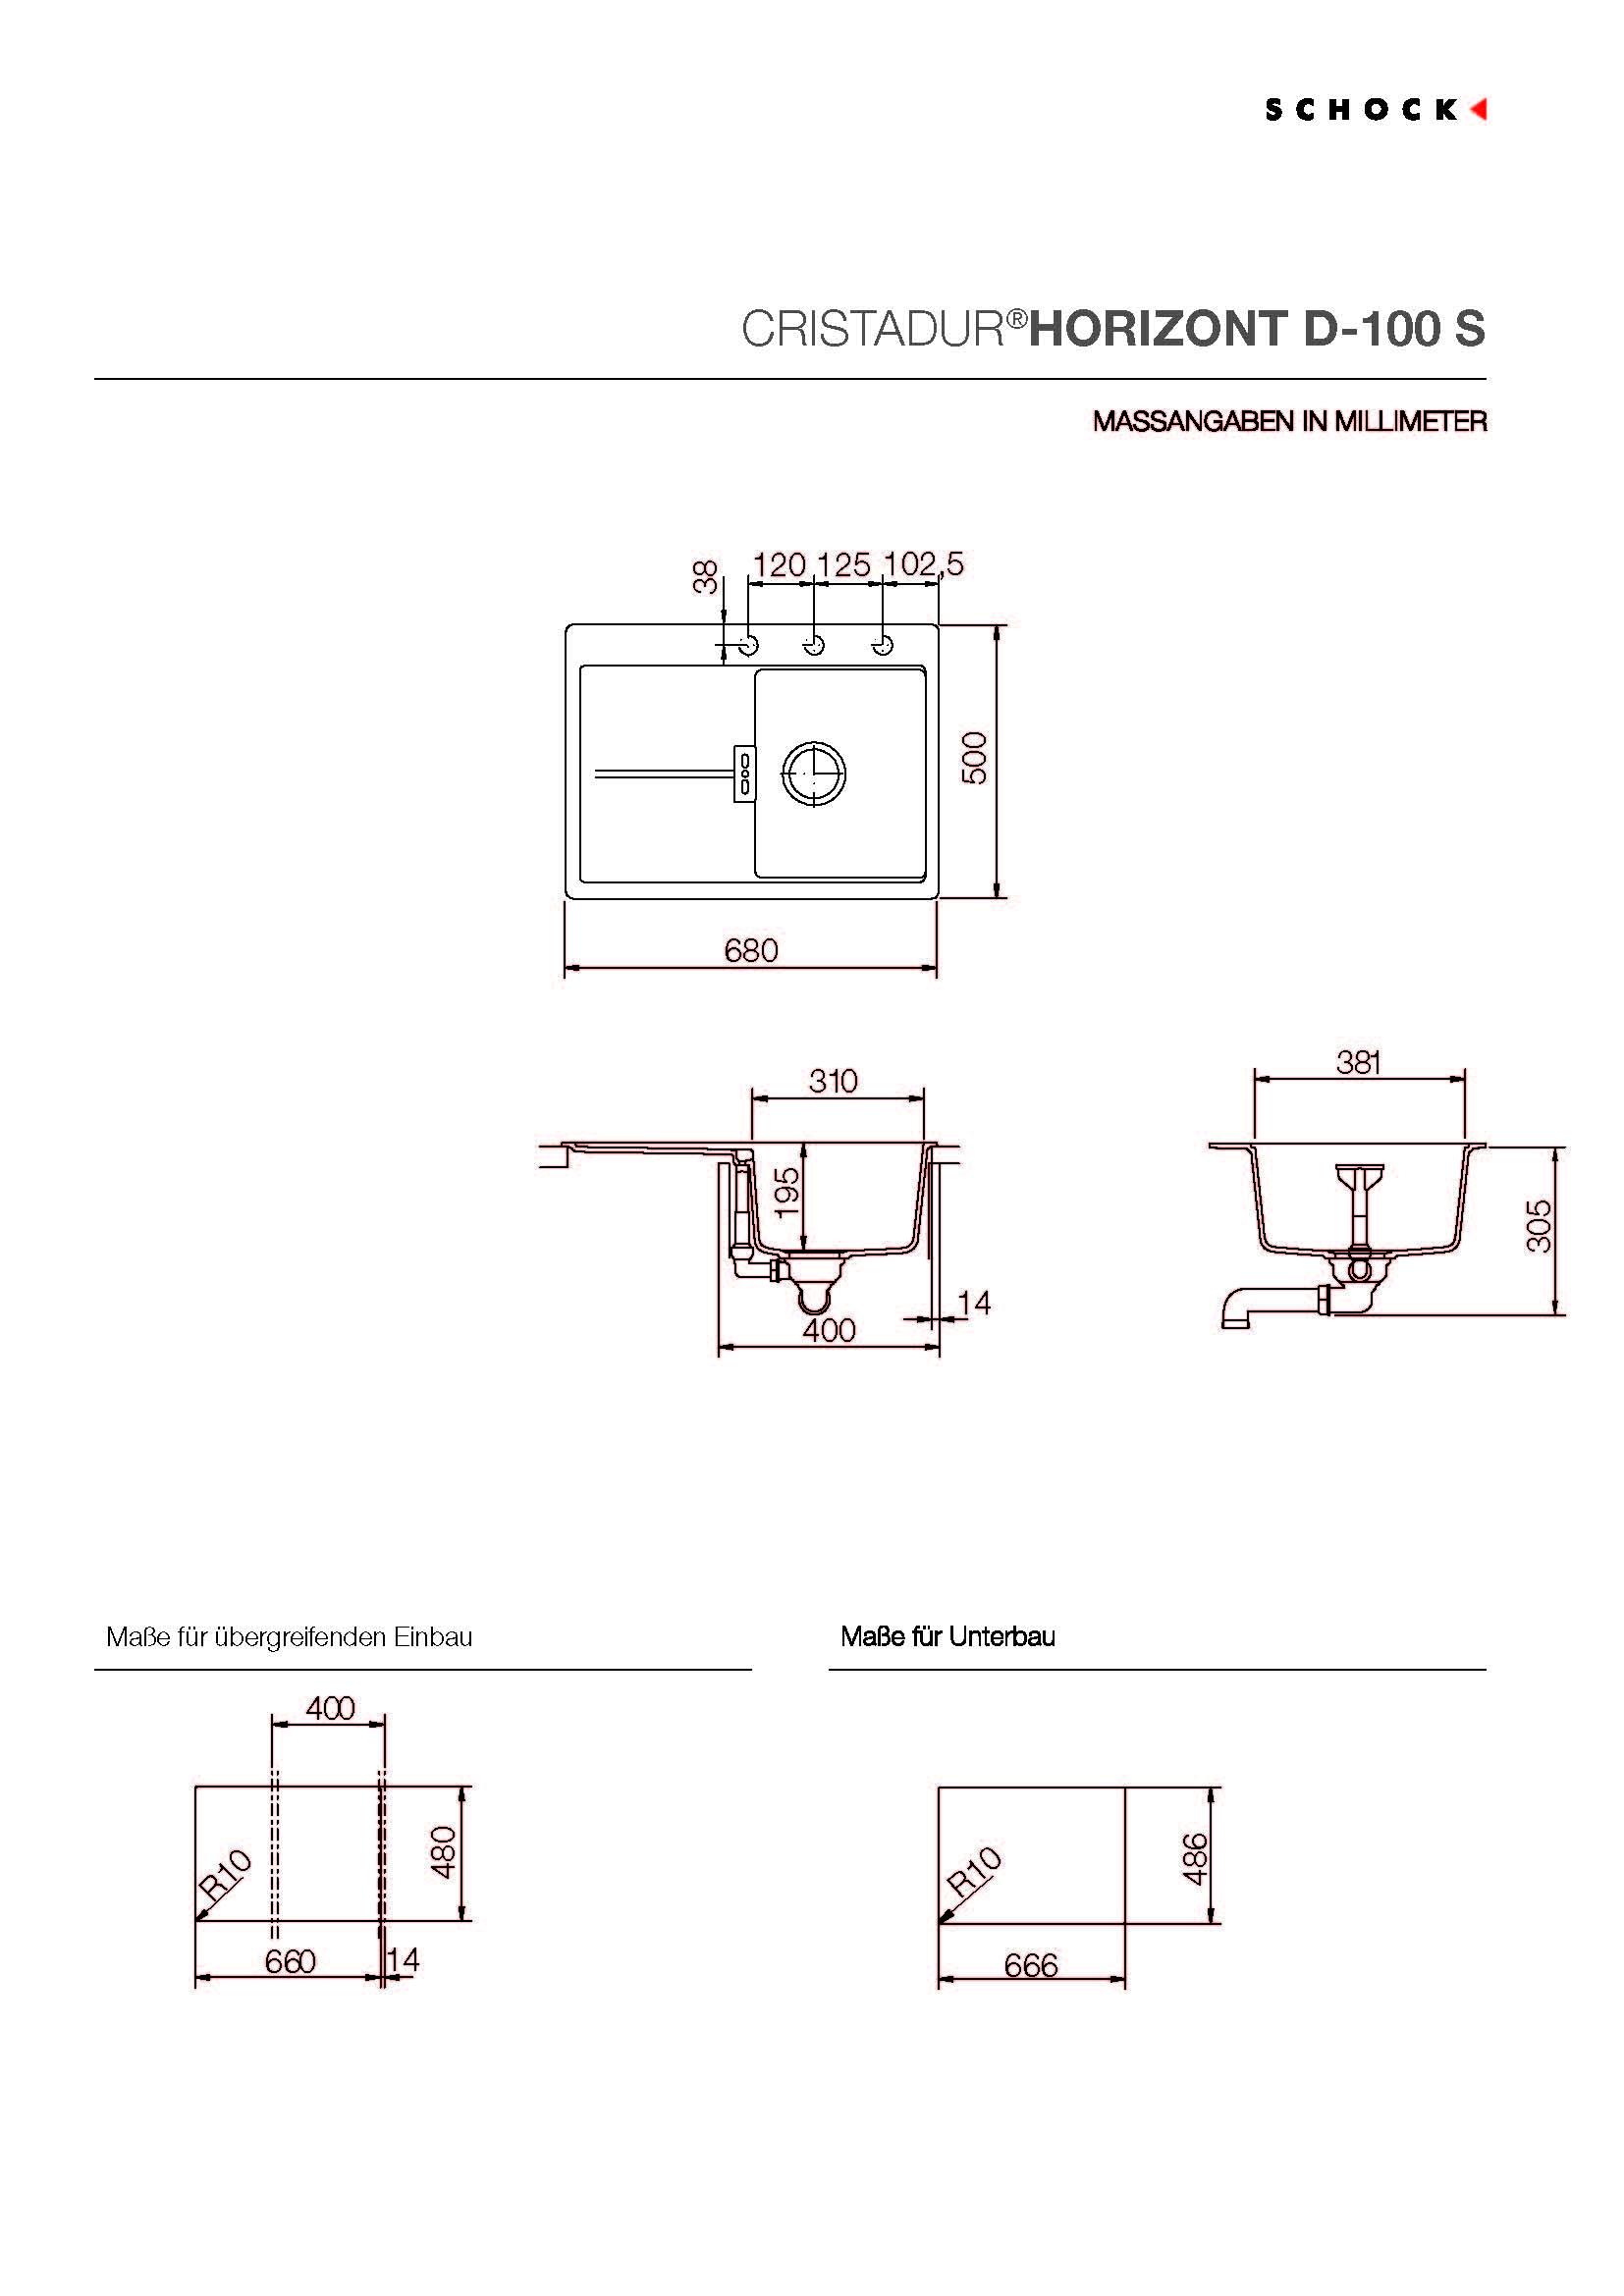 d ezy schock cristadur jednod ezy s odkapem schock horizont d 100s silverstone granitov. Black Bedroom Furniture Sets. Home Design Ideas